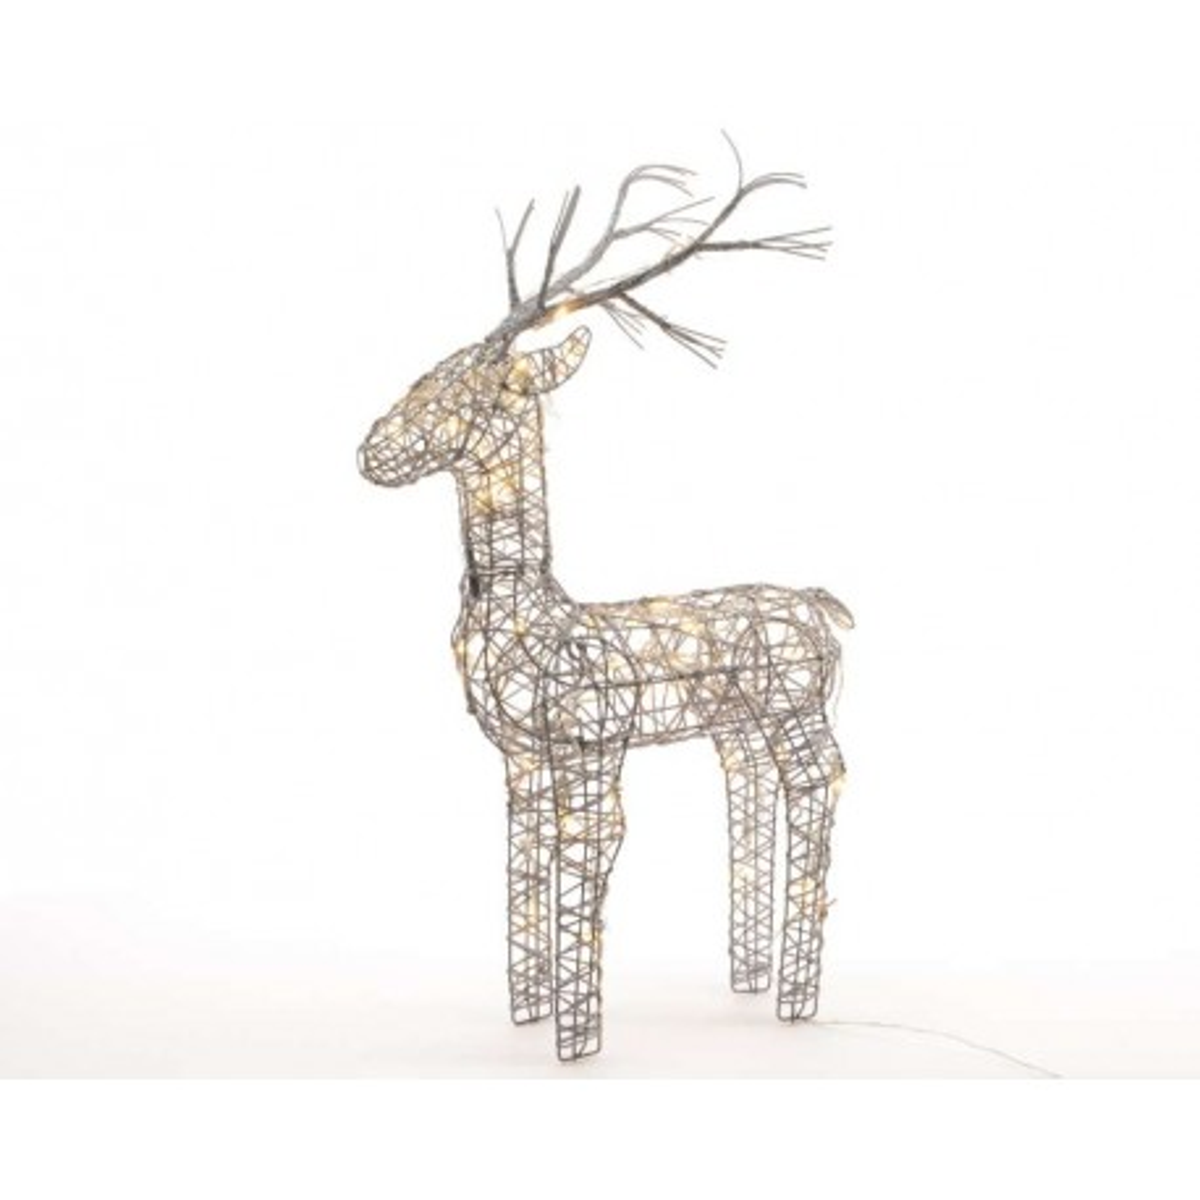 60cm Grey Wicker Standing Reindeer Outdoor - Warm White LED